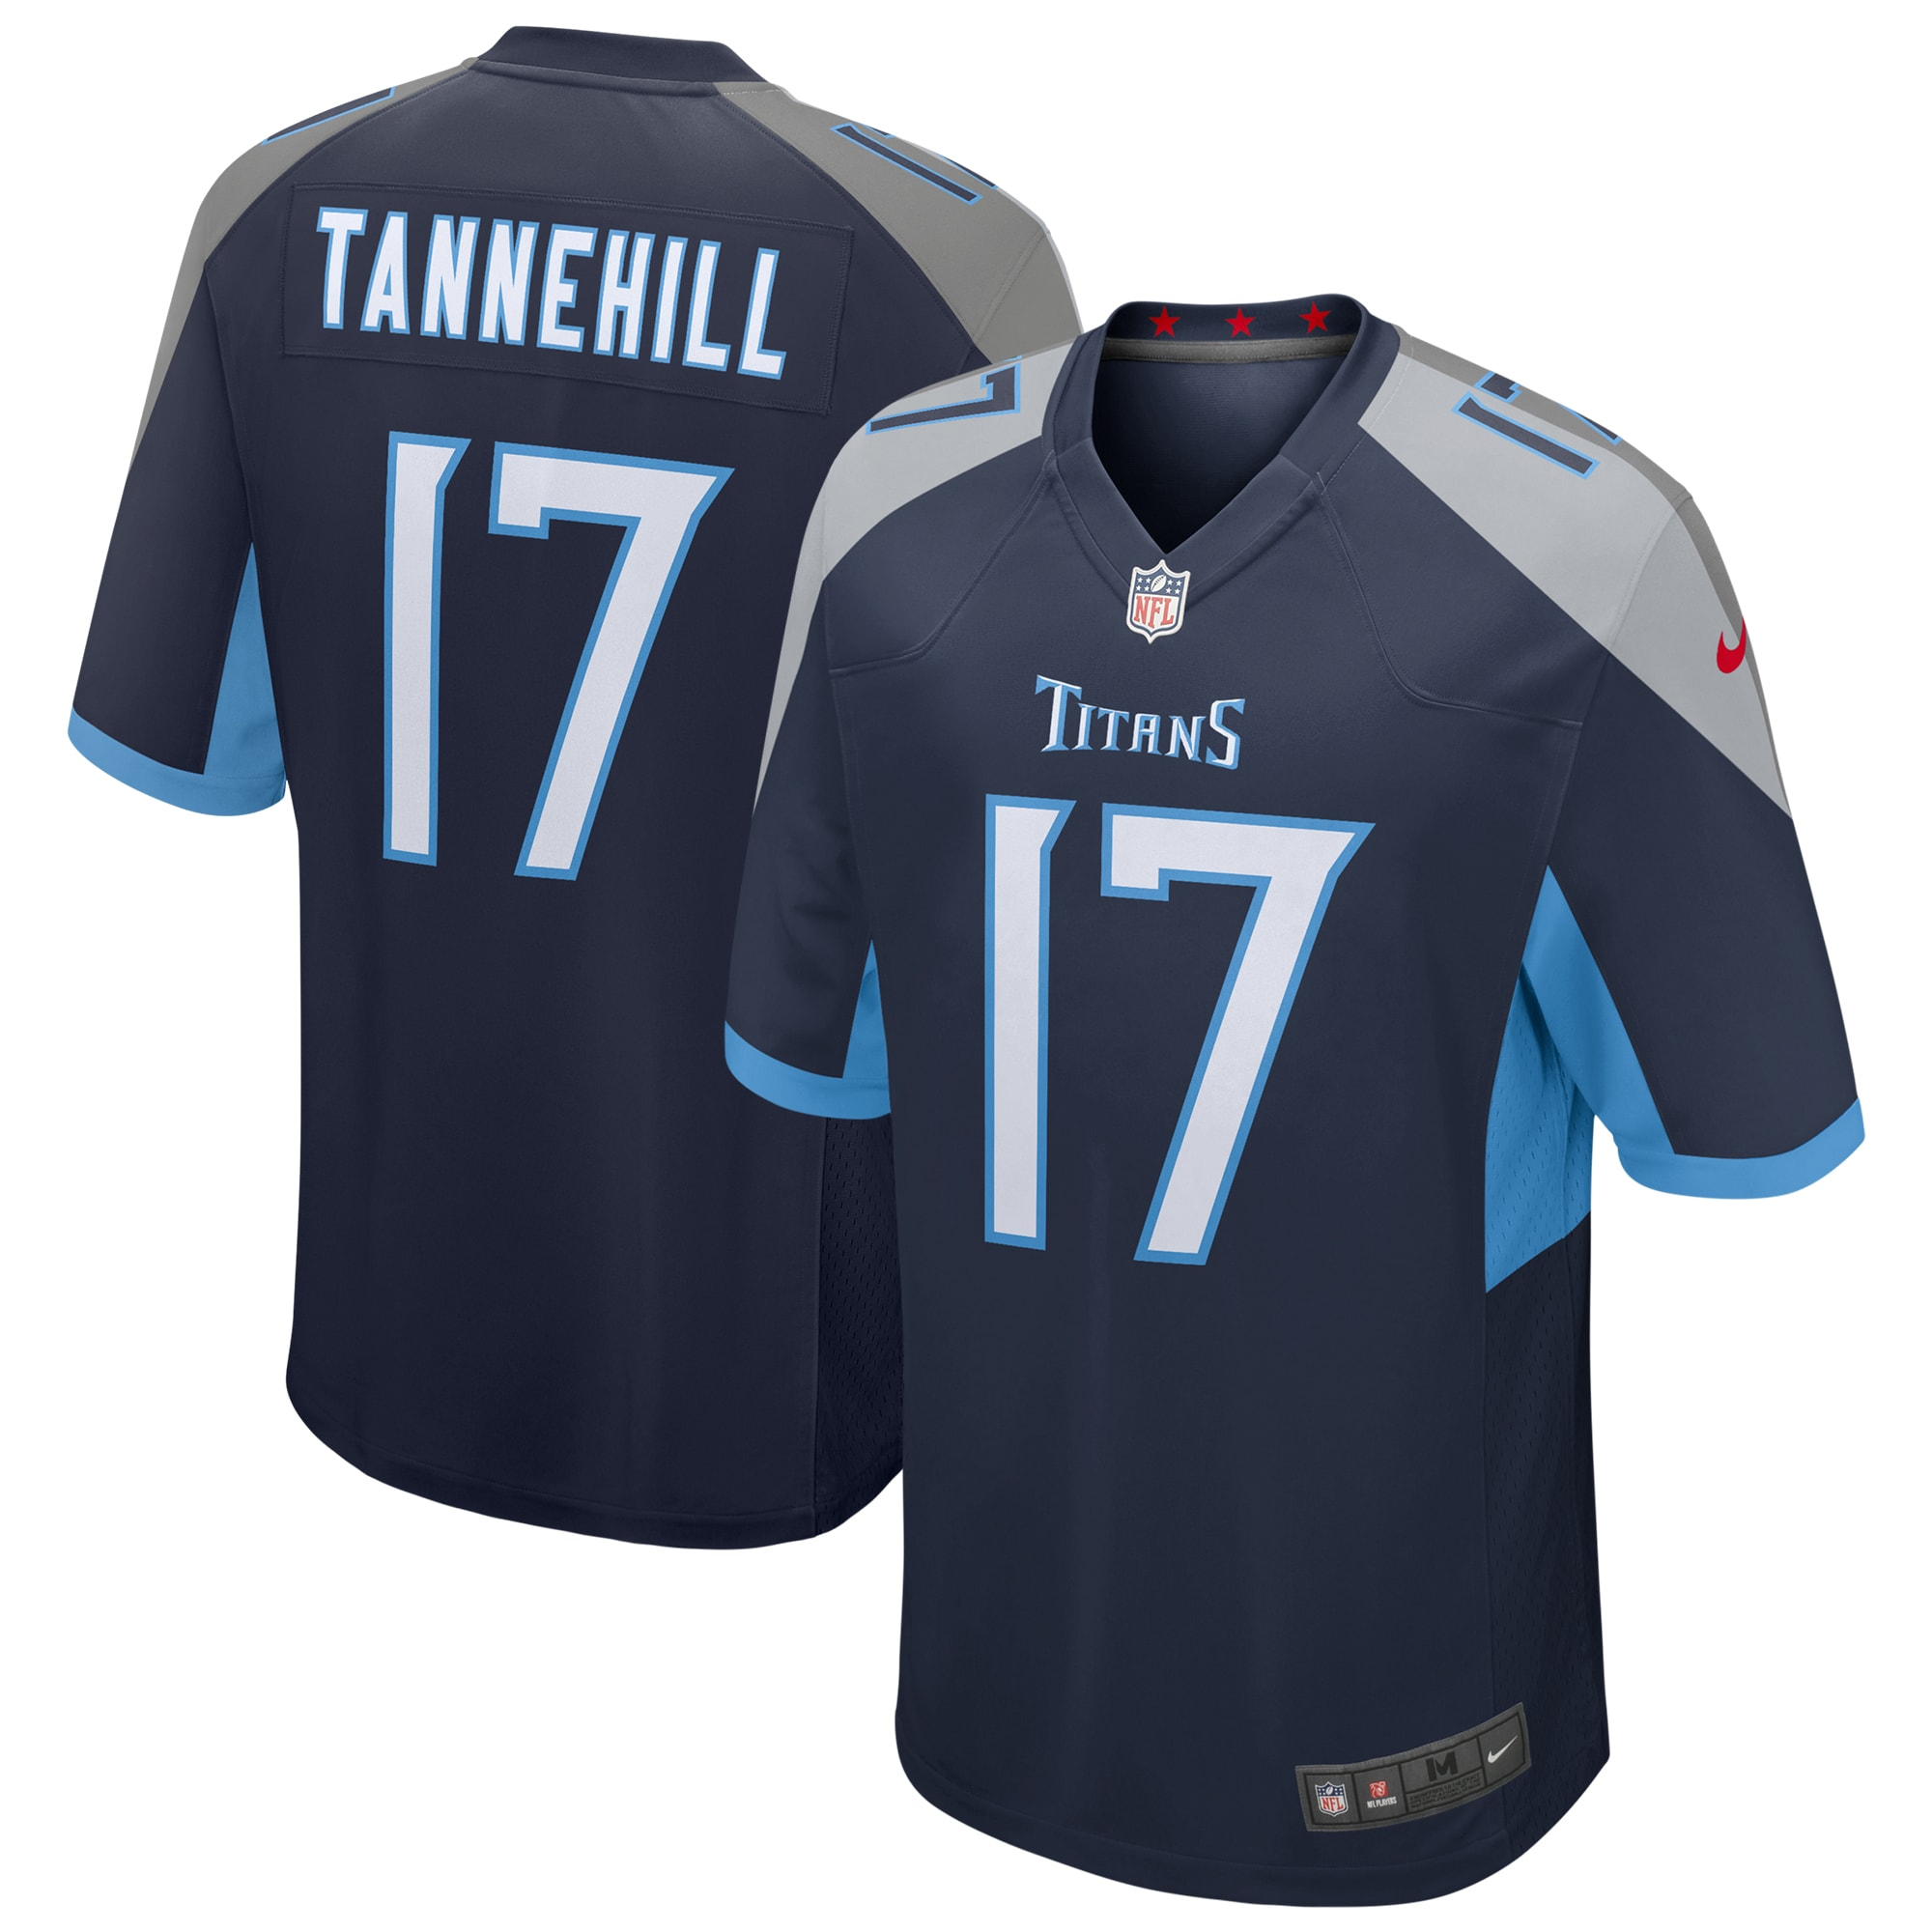 Ryan Tannehill Tennessee Titans Nike Game Jersey - Navy - Walmart.com